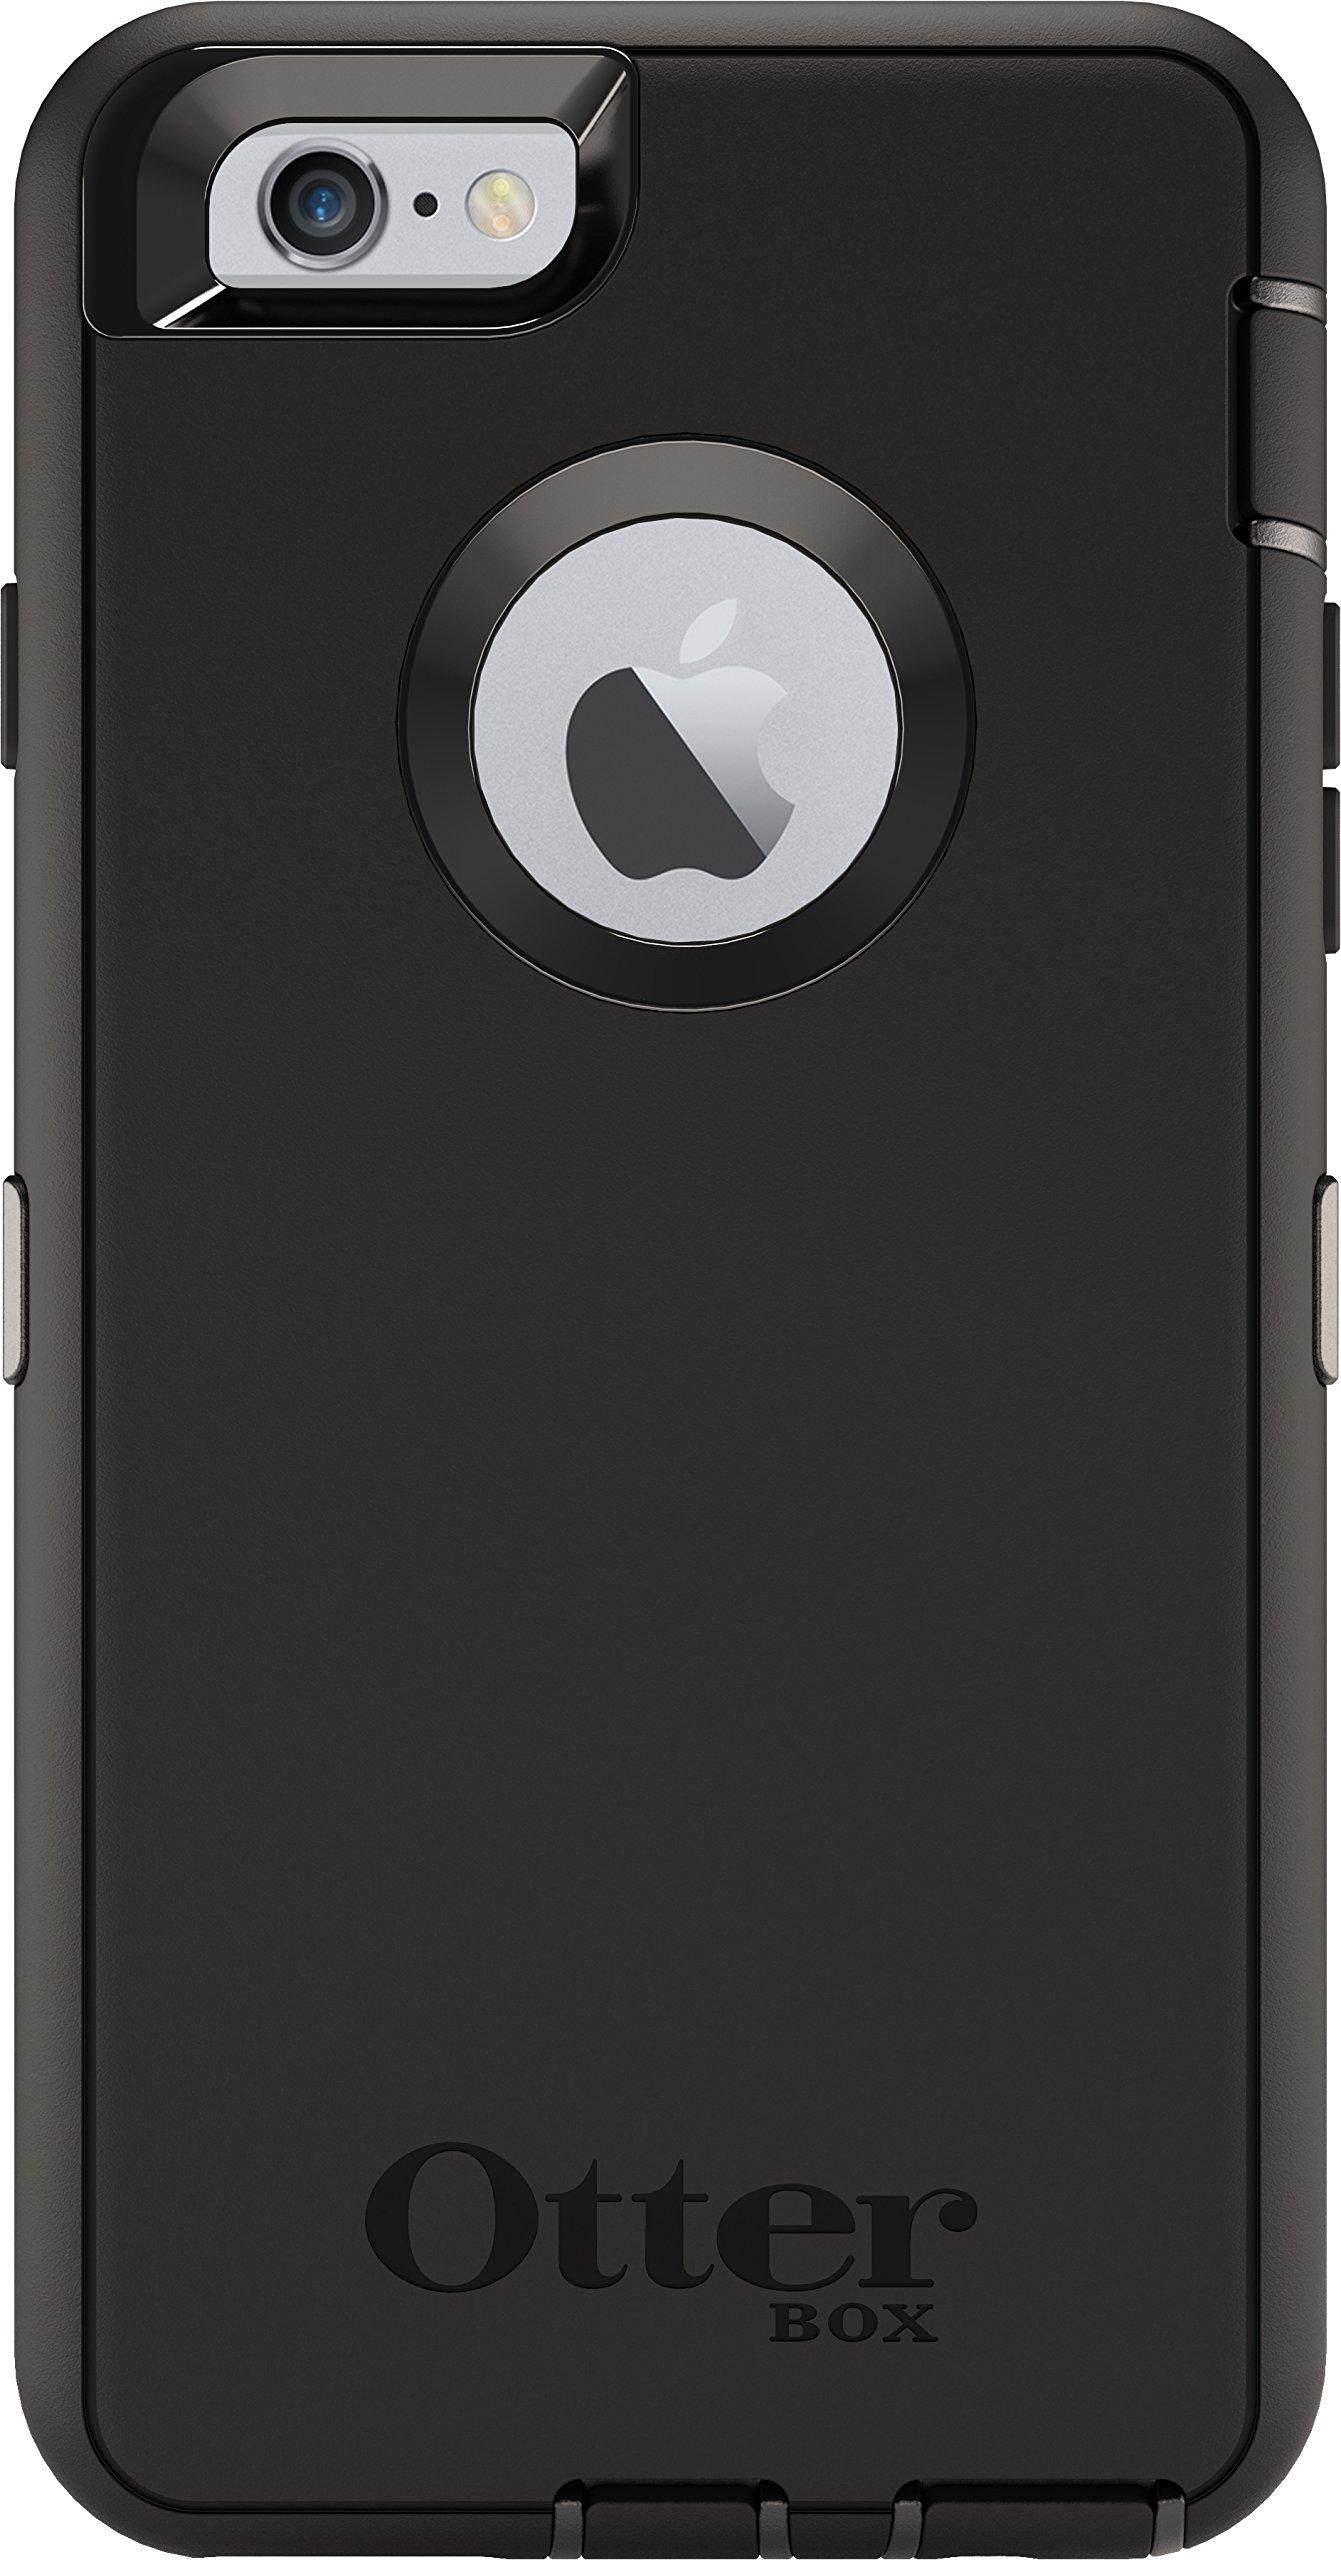 OtterBox DEFENDER iPhone 6/6s Case - Frustration Free Packaging - BLACK